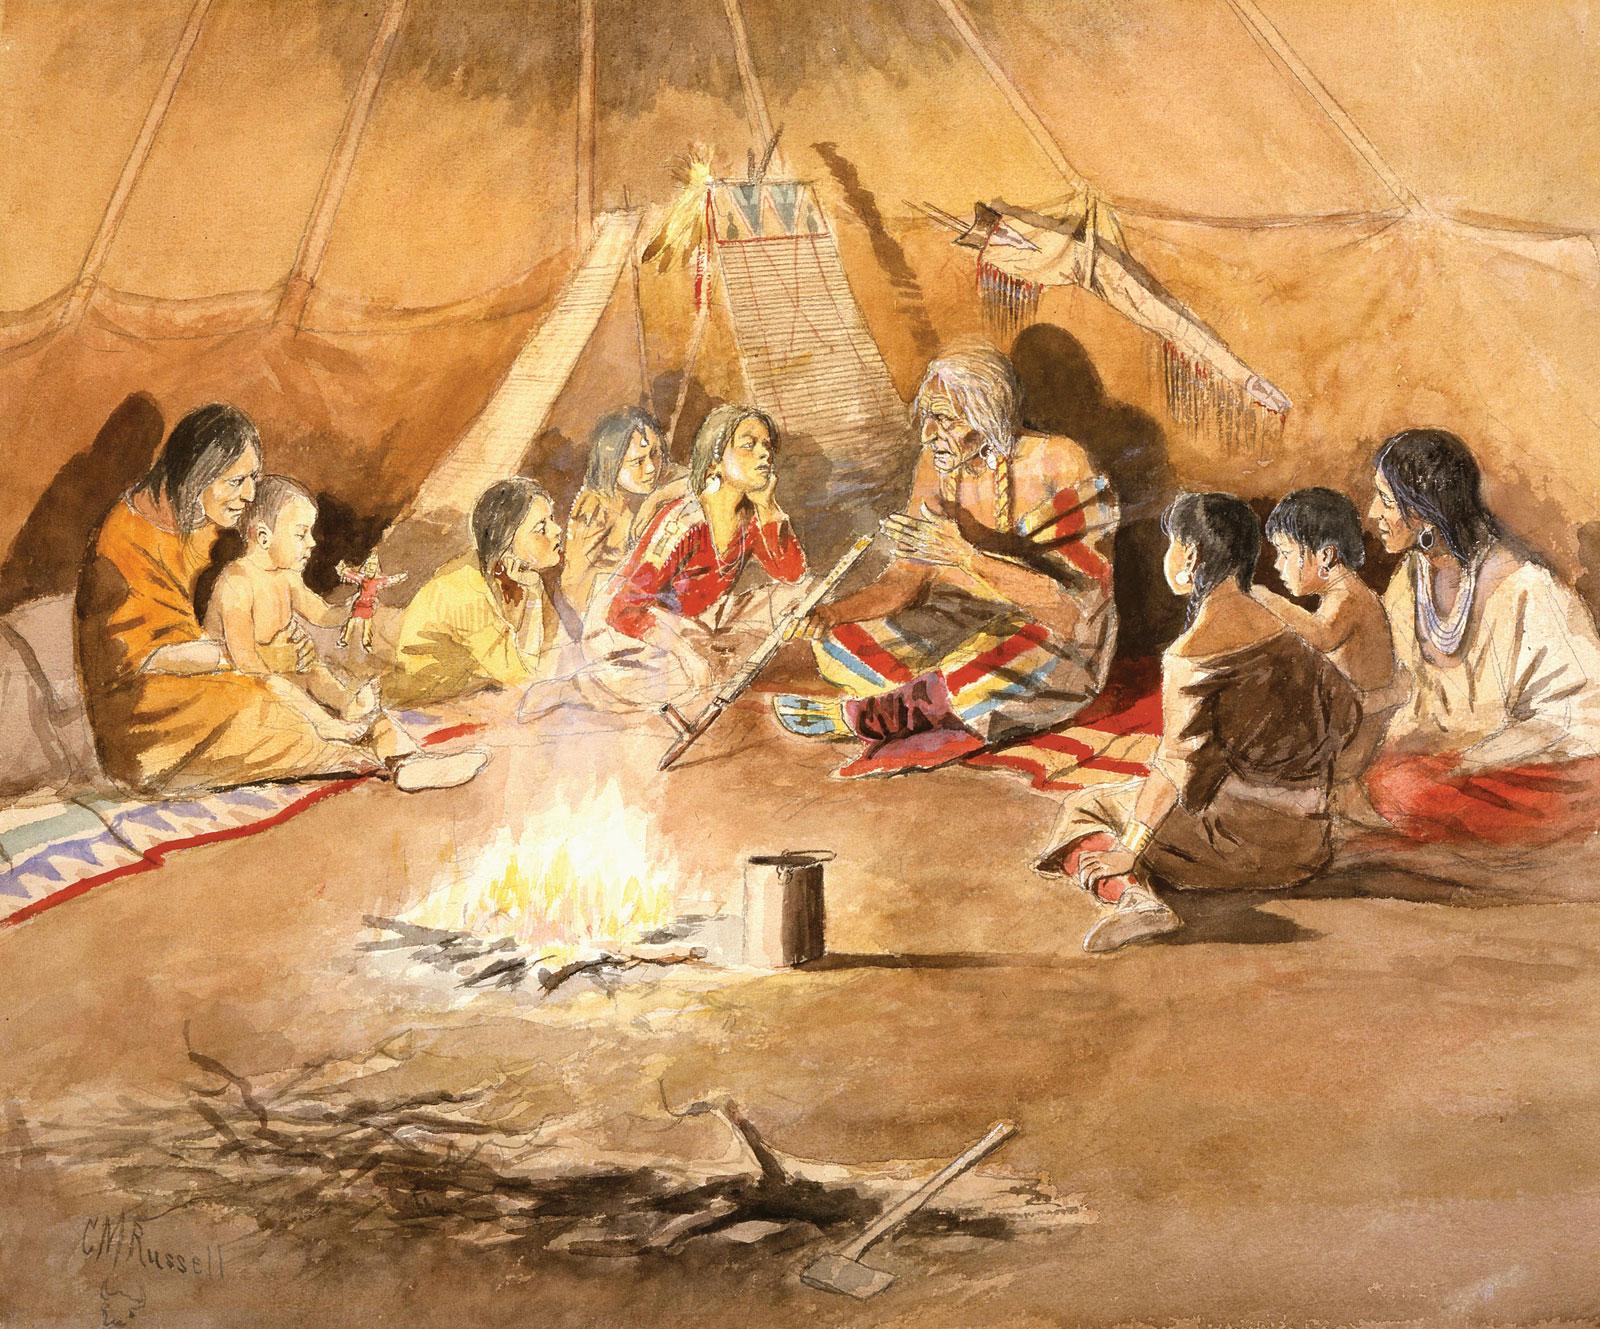 Histoire orale autochtone